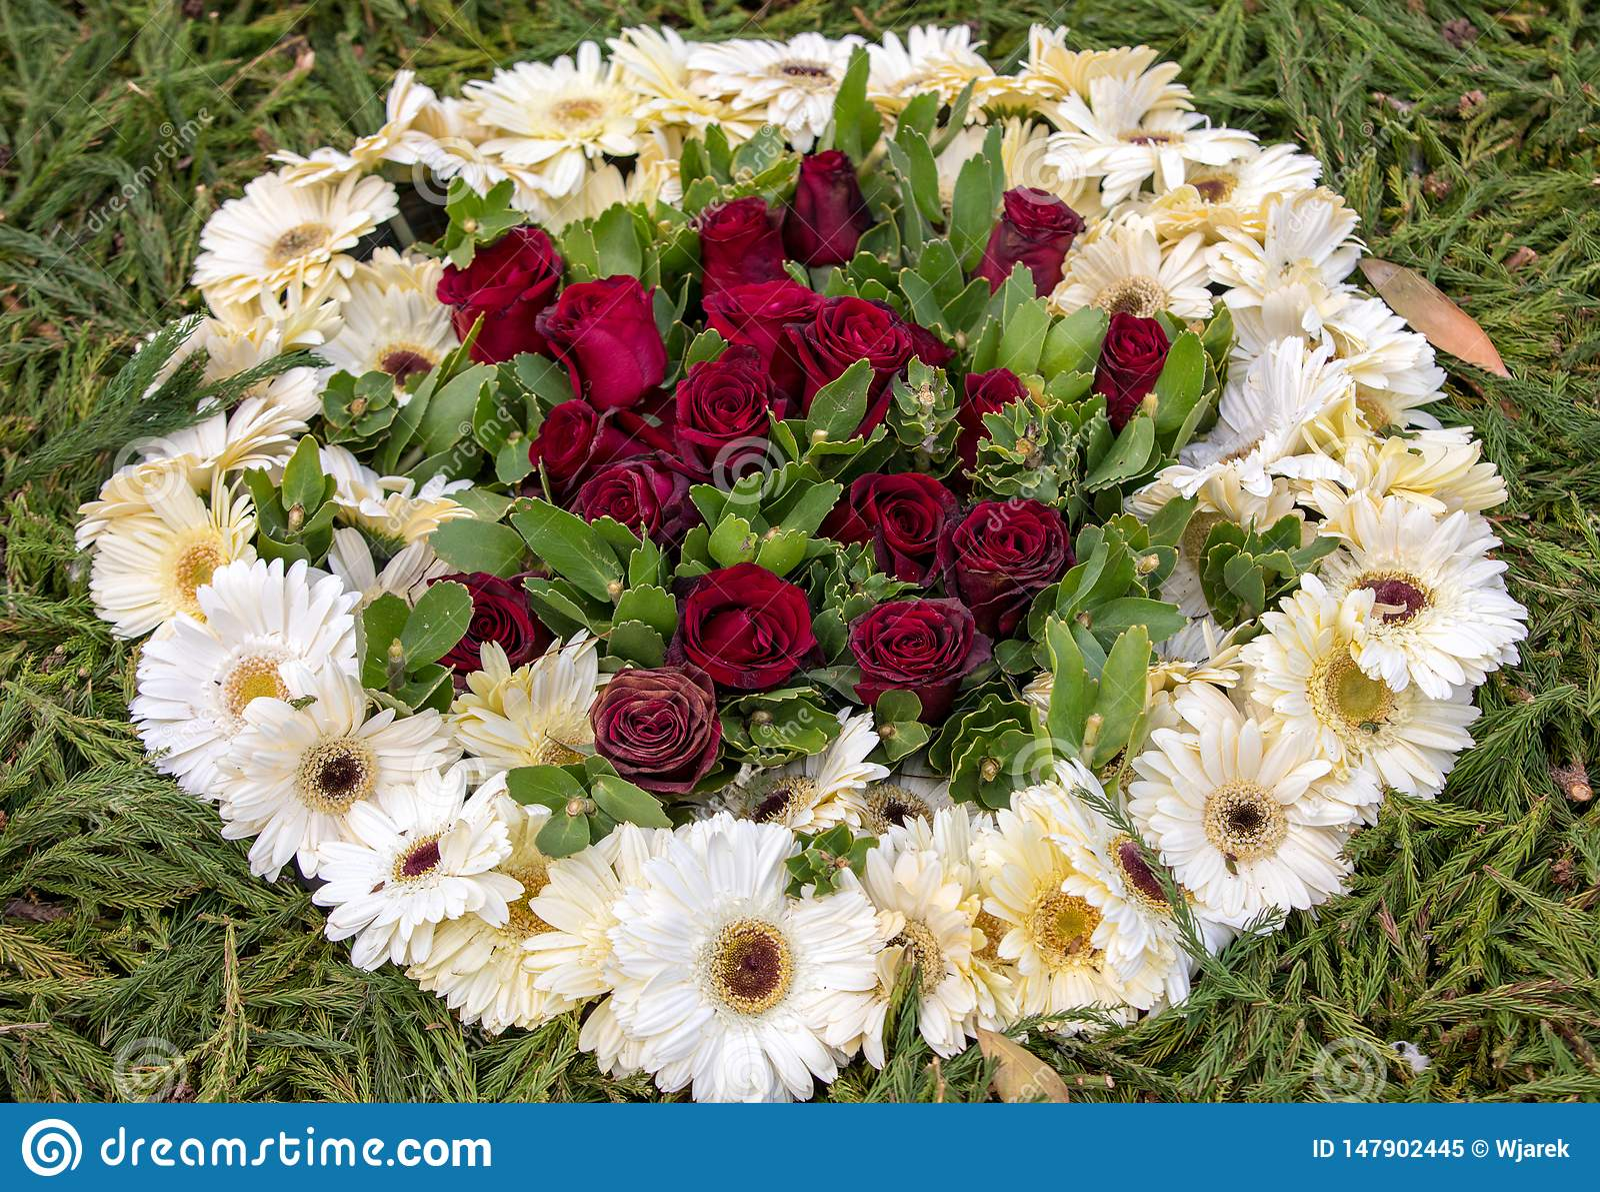 Floristic διακόσμηση ομορφιάς με τα ζωηρόχρωμα τροπικά λουλούδια